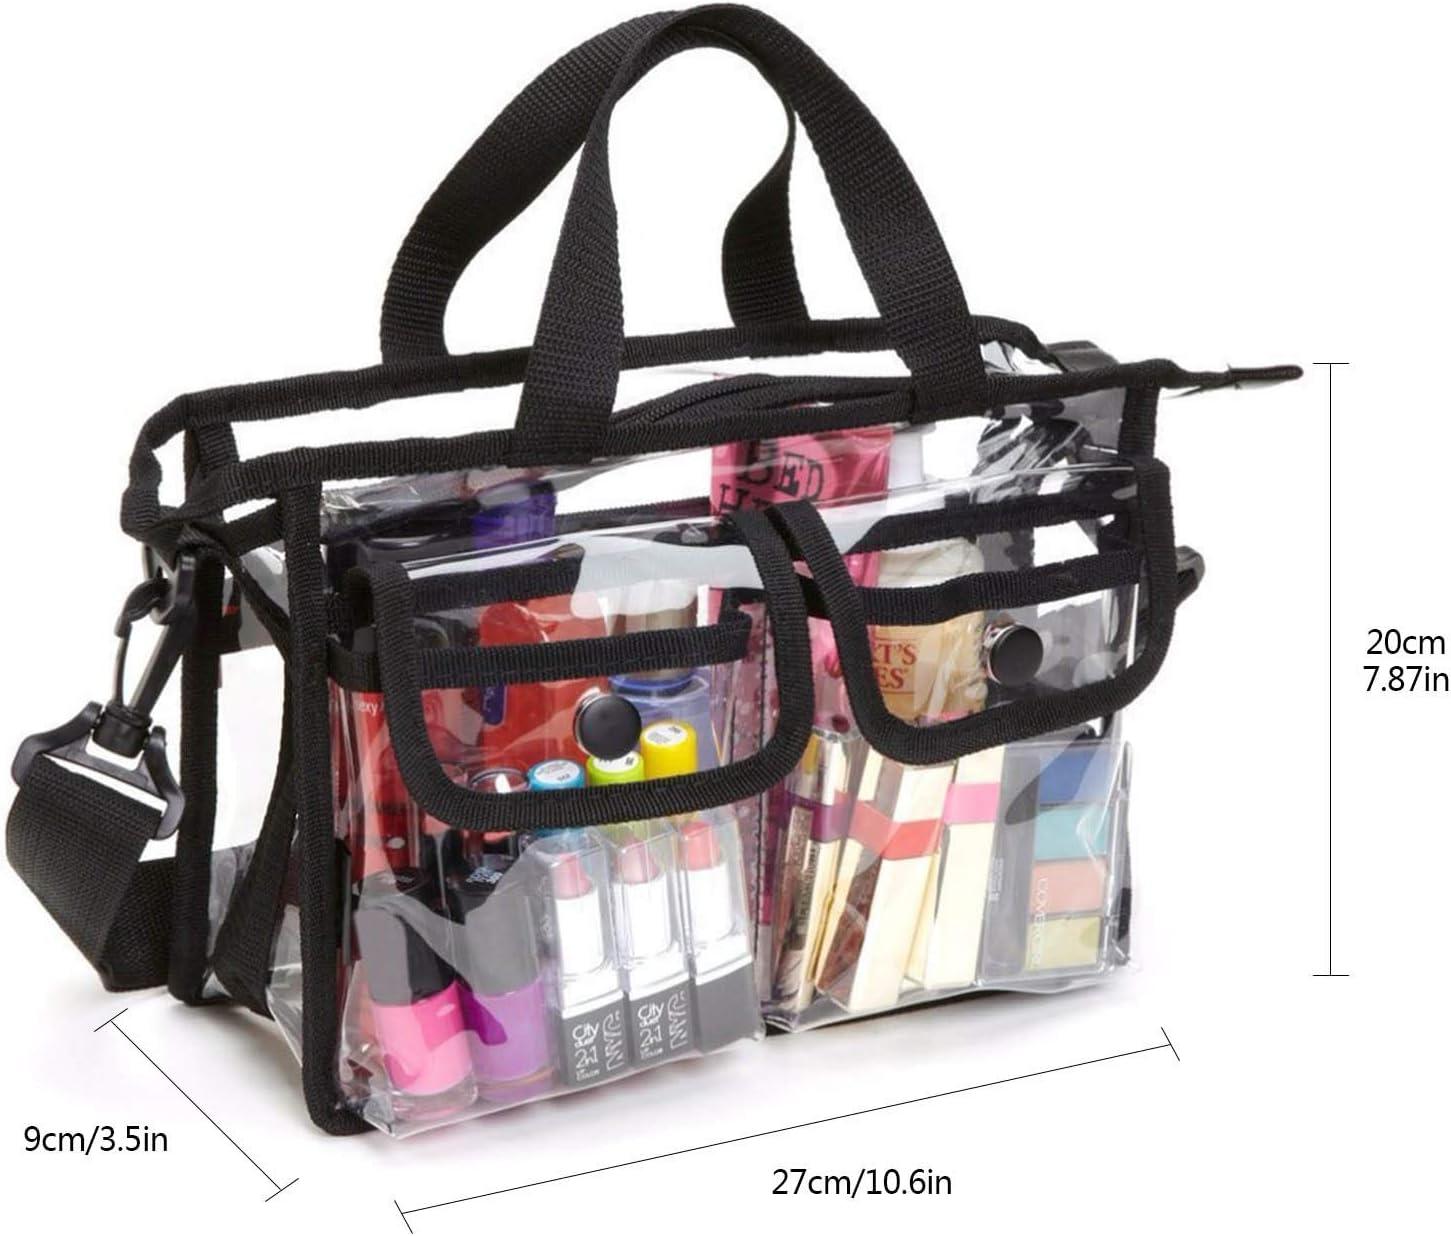 bolsa de almacenamiento de cosm/éticos EVA bolsa de viaje port/átil de maquillaje para mujeres y ni/ñas bolsas de aseo impermeables bolsa de hombro para viajes de playa Bolsa transparente